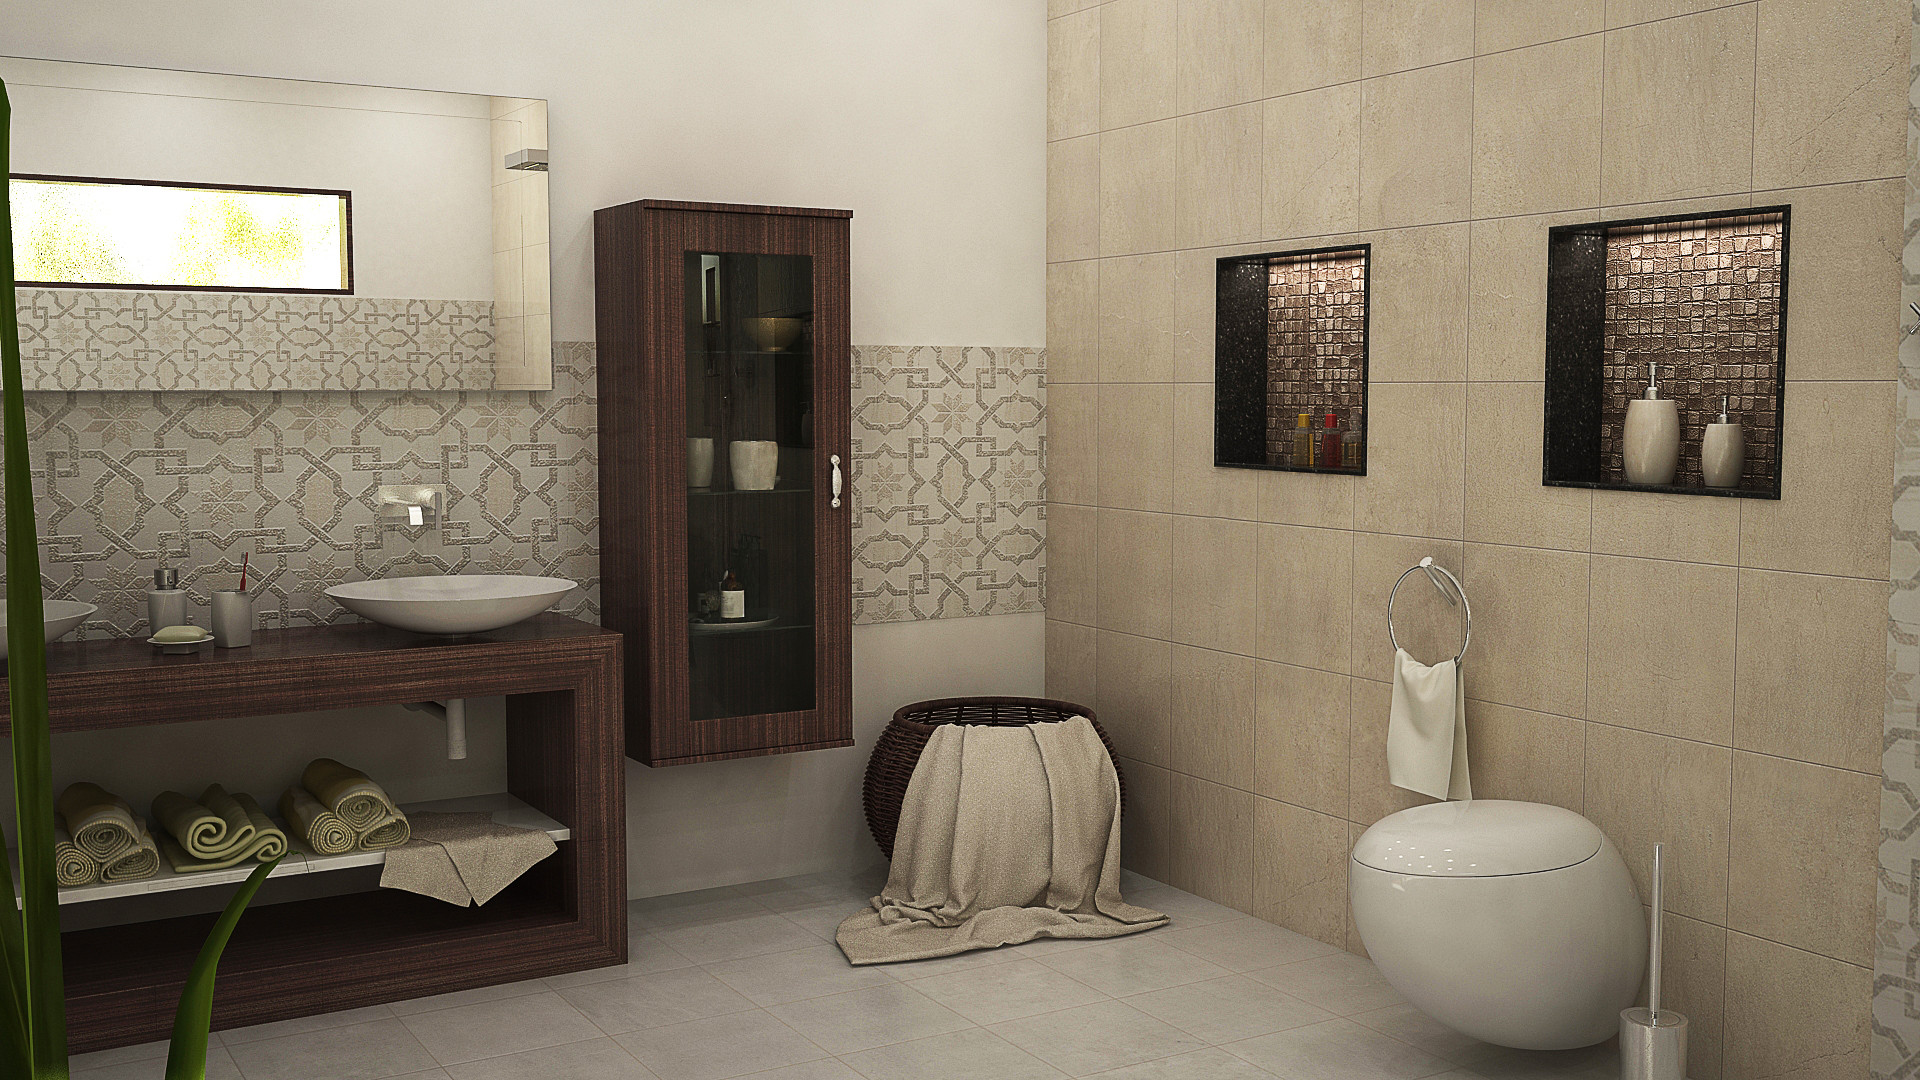 Swapnil parmar bathroom 1 view02 pp